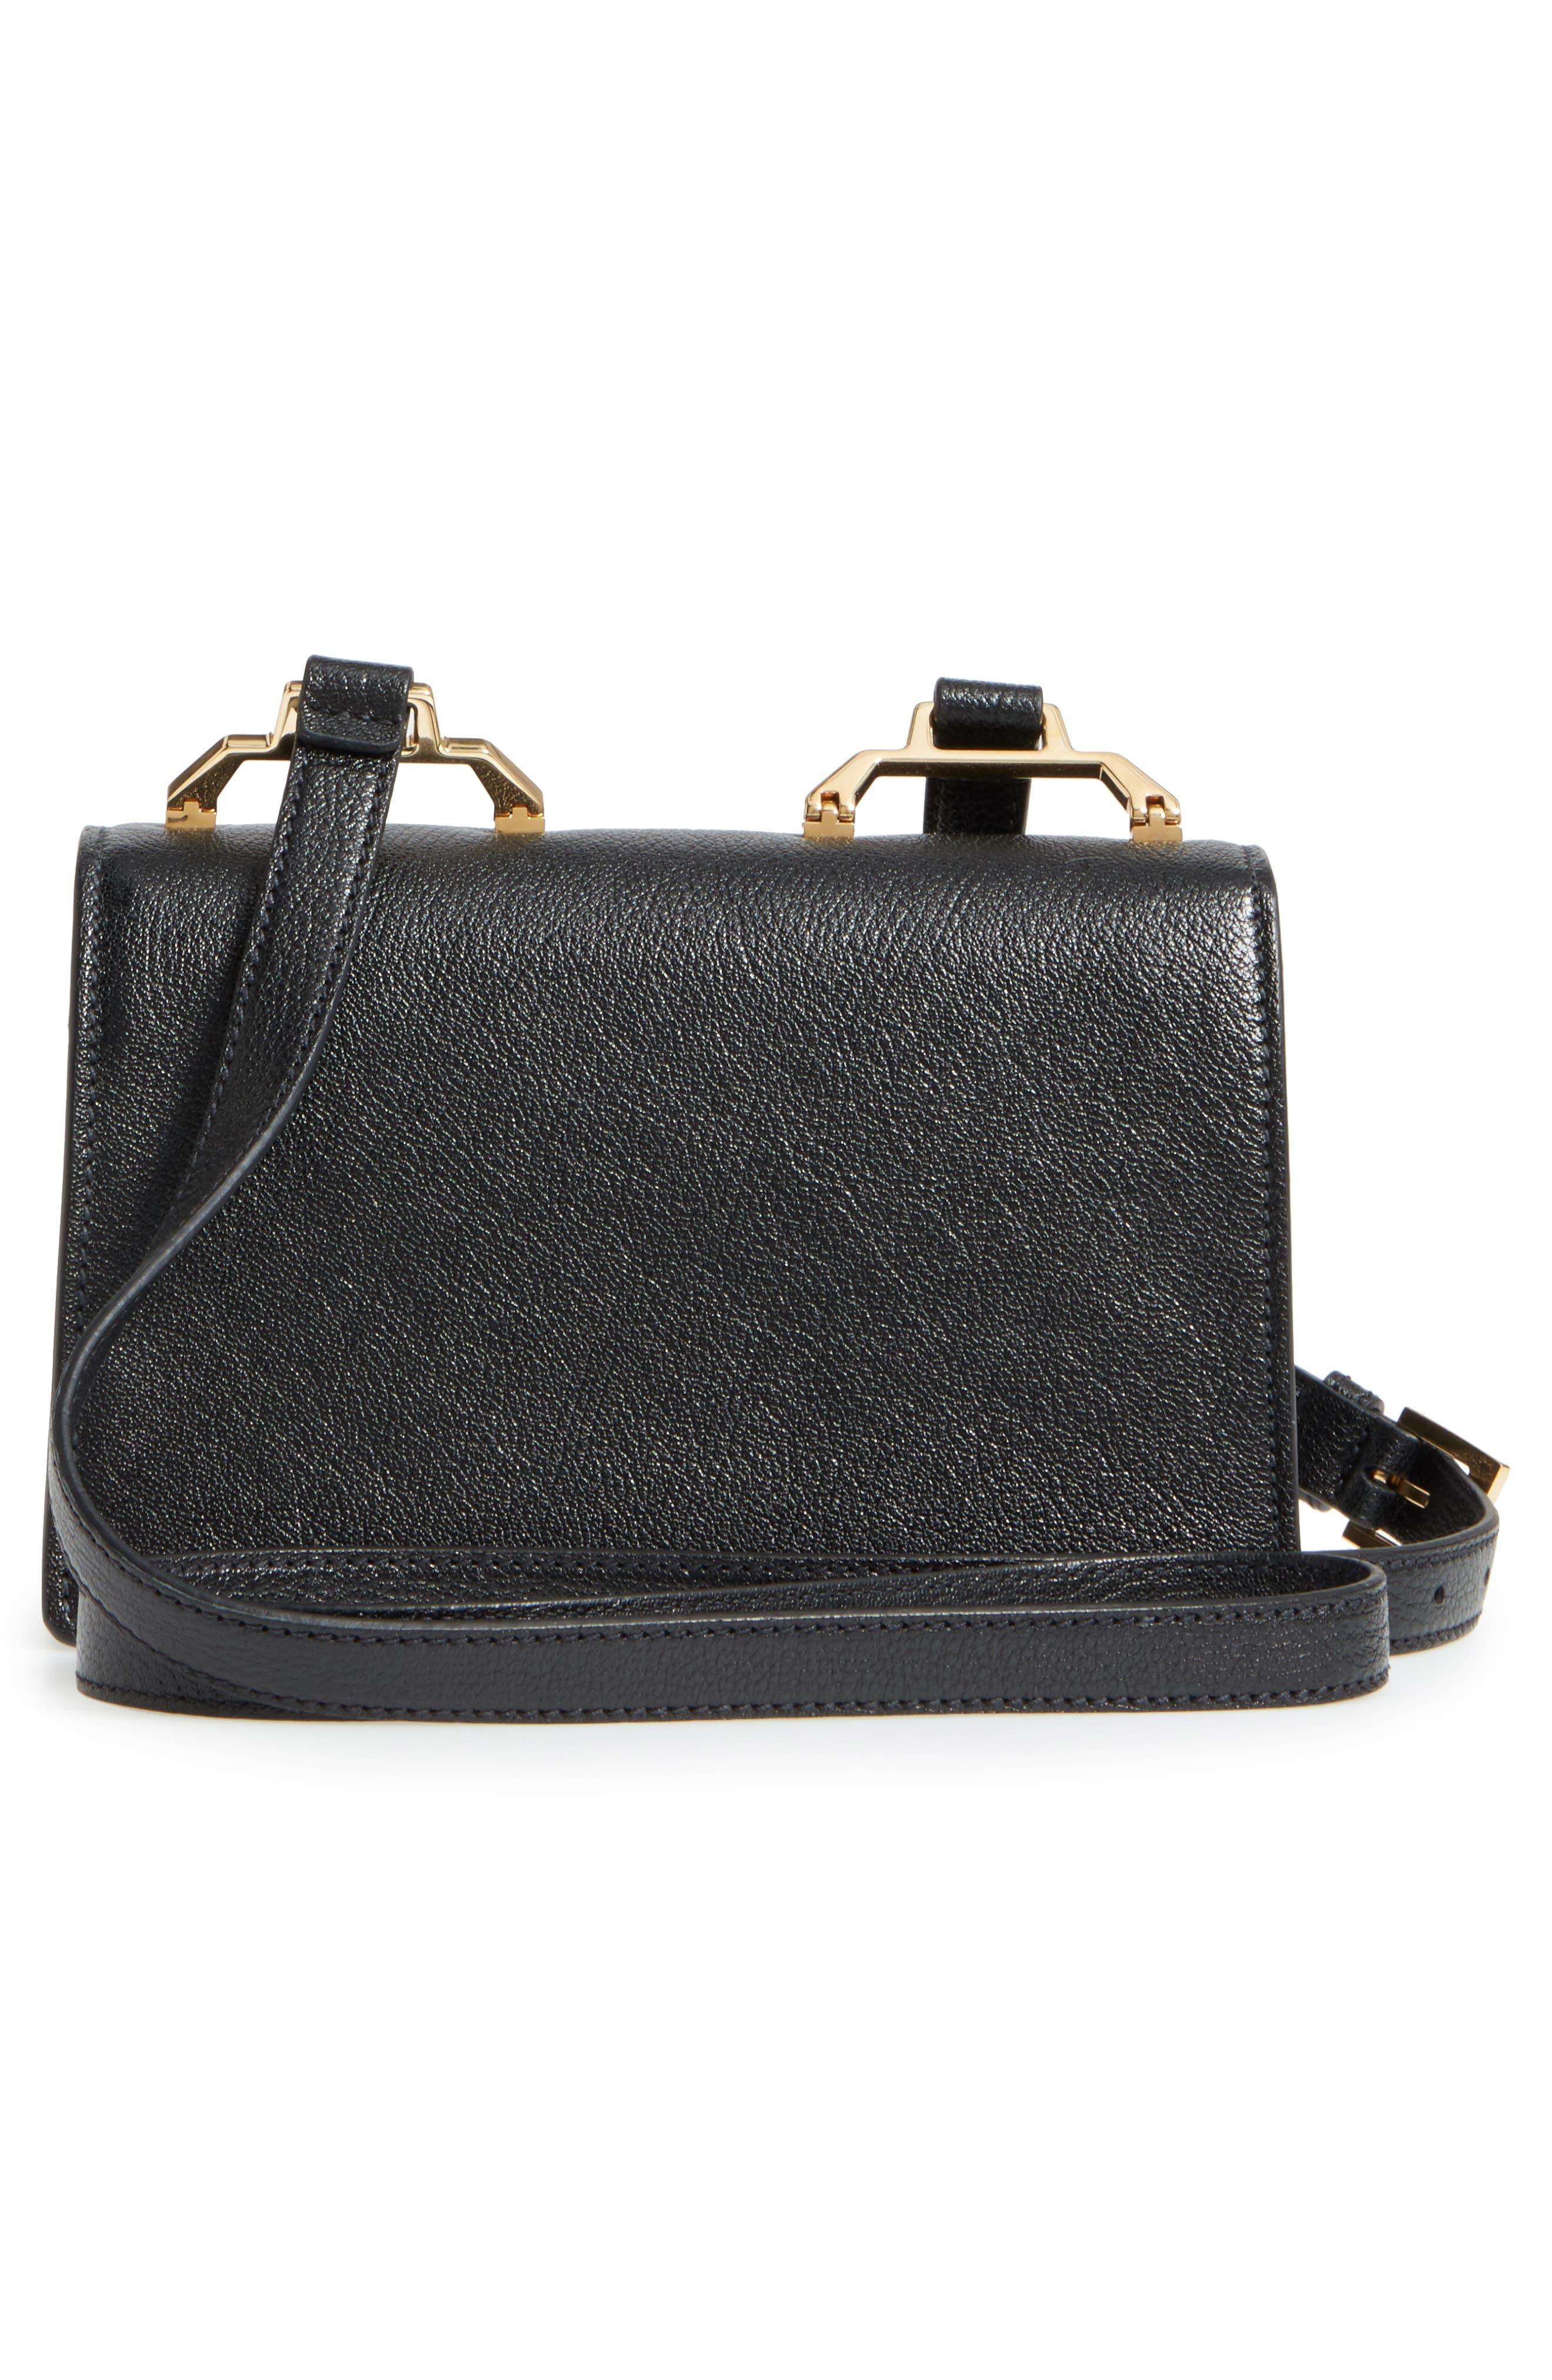 Madras Leather Crossbody Bag,                             Alternate thumbnail 3, color,                             001